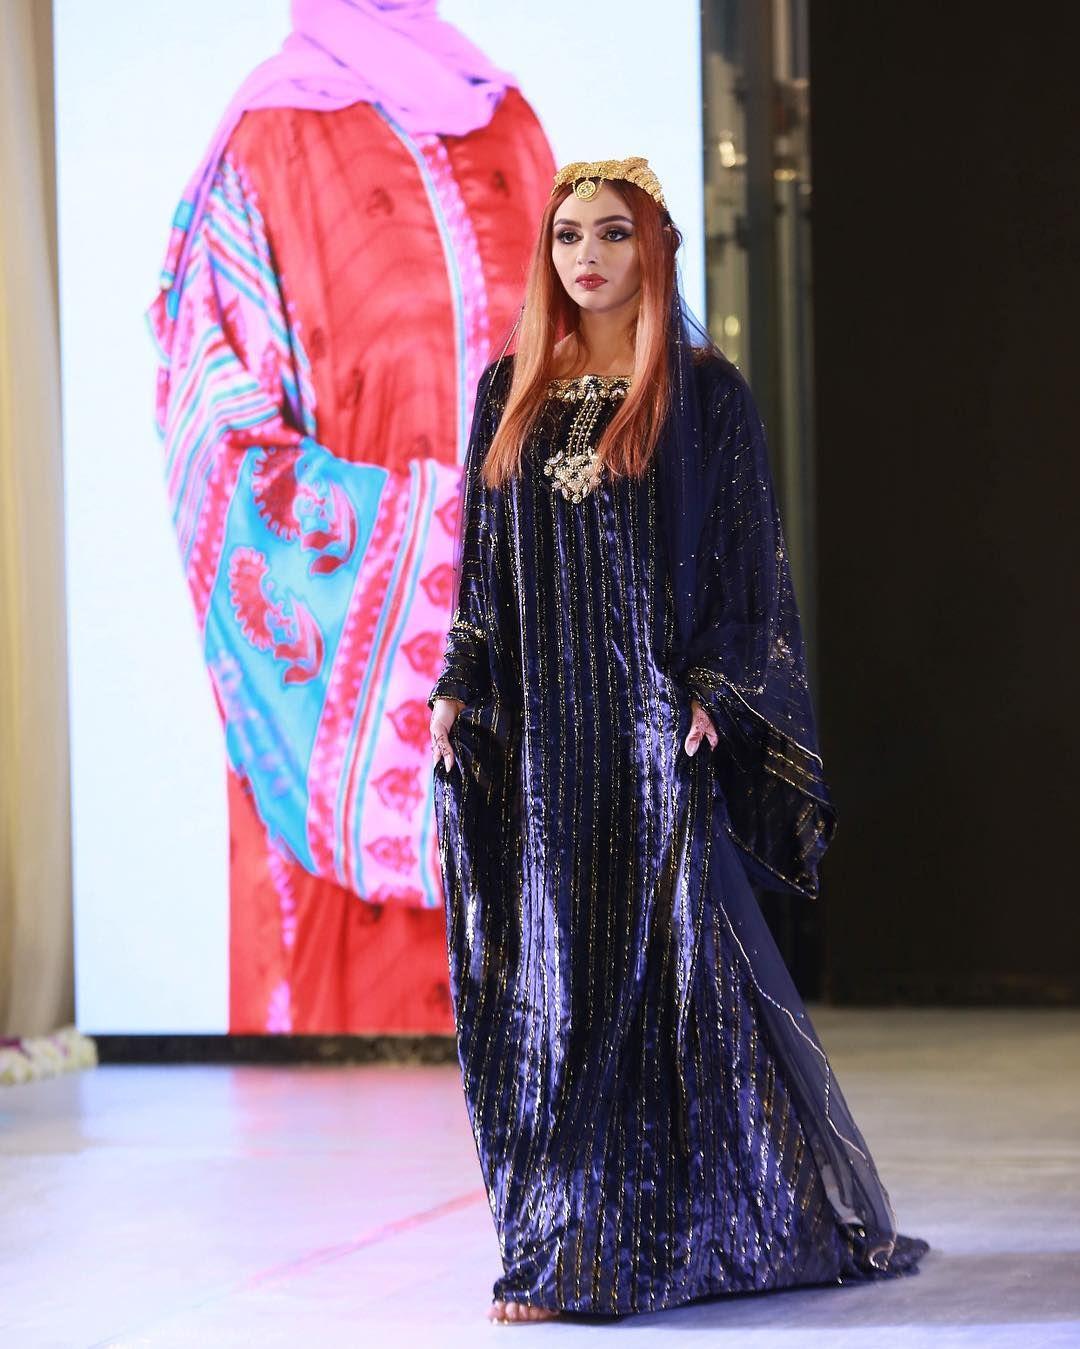 82 Likes 3 Comments Designer Safa Albalushi Daribraisim On Instagram كولكشن جديد الماضي الثوب الظفاري من قماش المخمل الفاخر لون Fashion Saree Sari